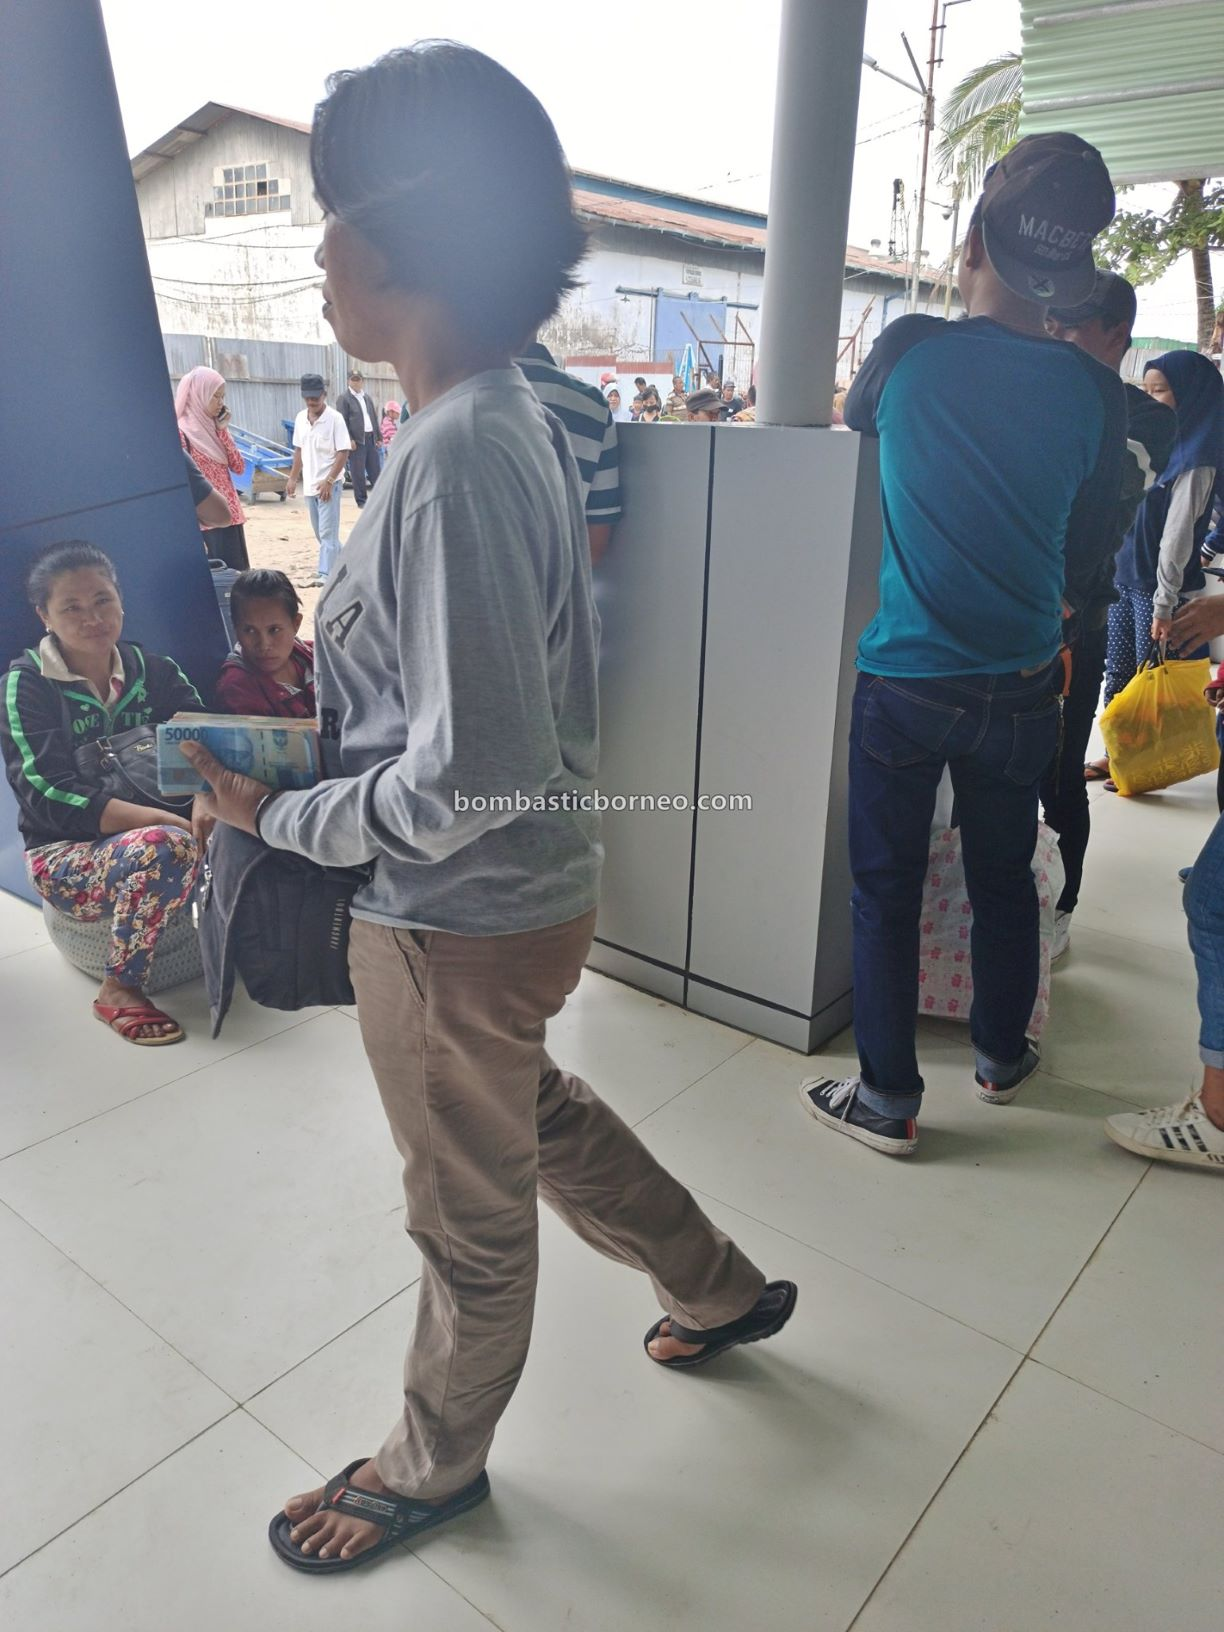 express boat, international, Transportation, backpackers, destination, exploration, Kalimantan Utara, Obyek wisata, tourism, travel guide, Trans Border,